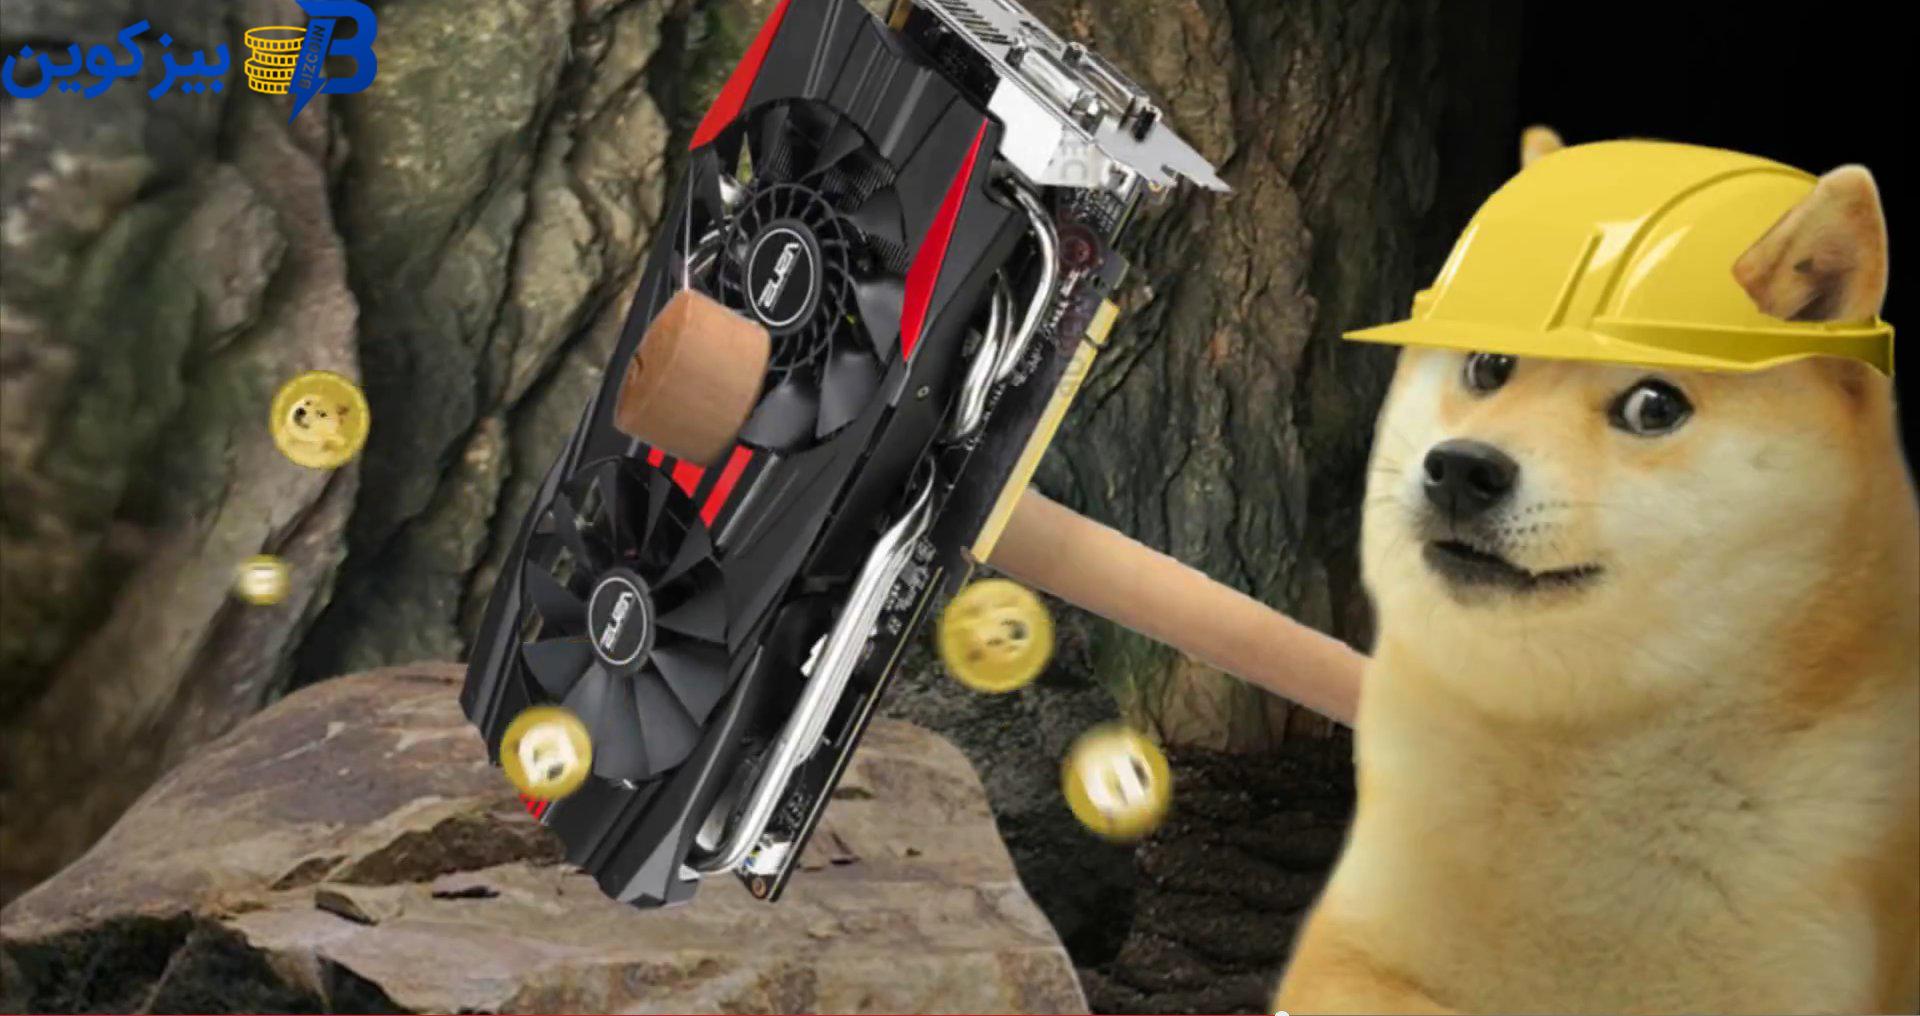 dogecoin mining استخراج دوج کوین چگونه است؟ همه چیز درباره دوج کوین